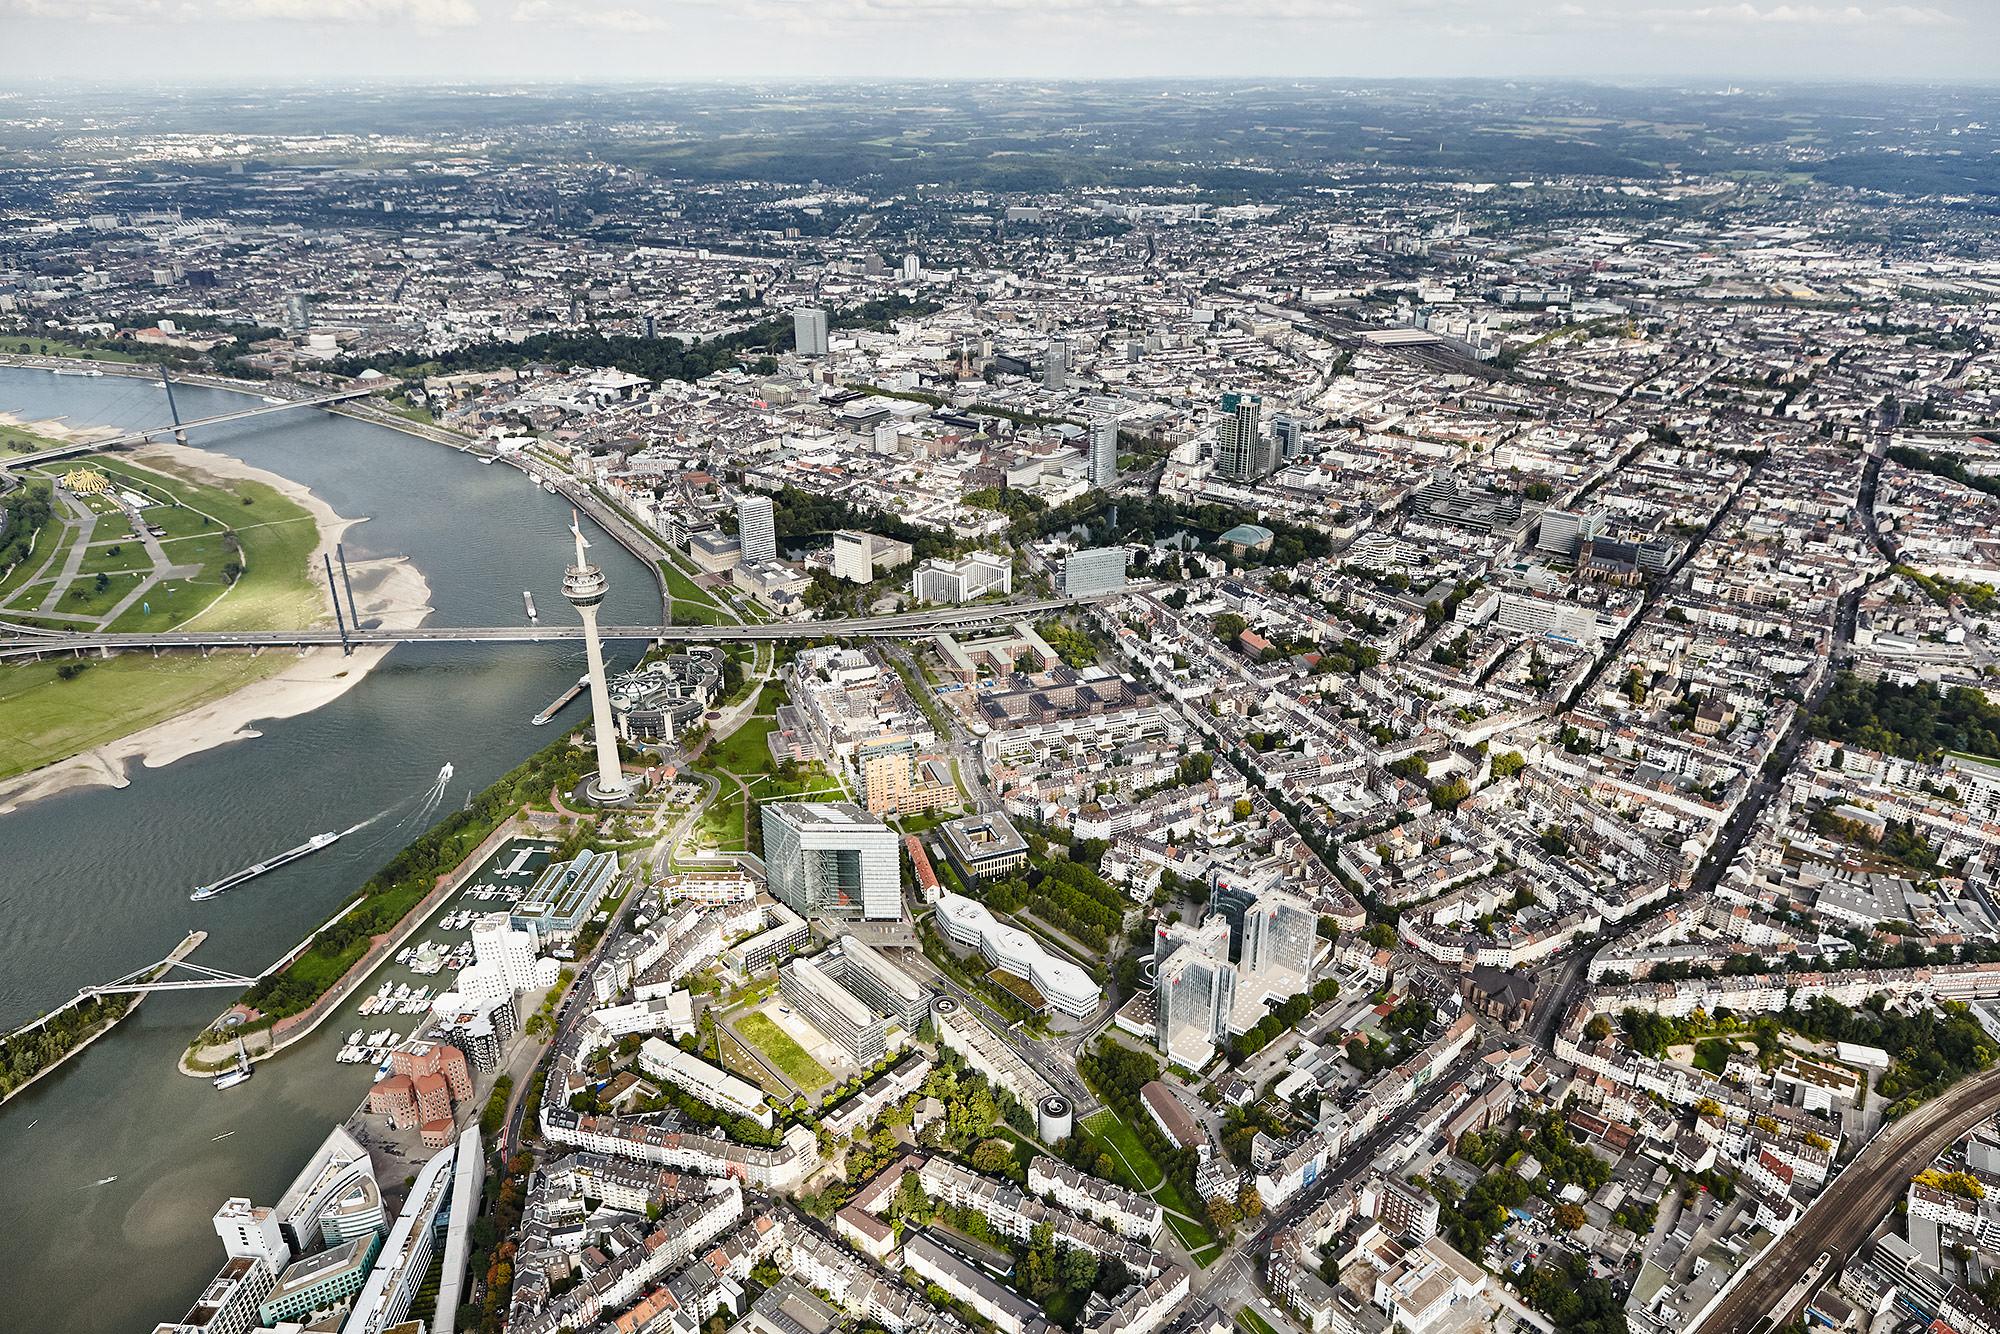 Düsseldorf aus dem Helikopter @ Philip Kistner